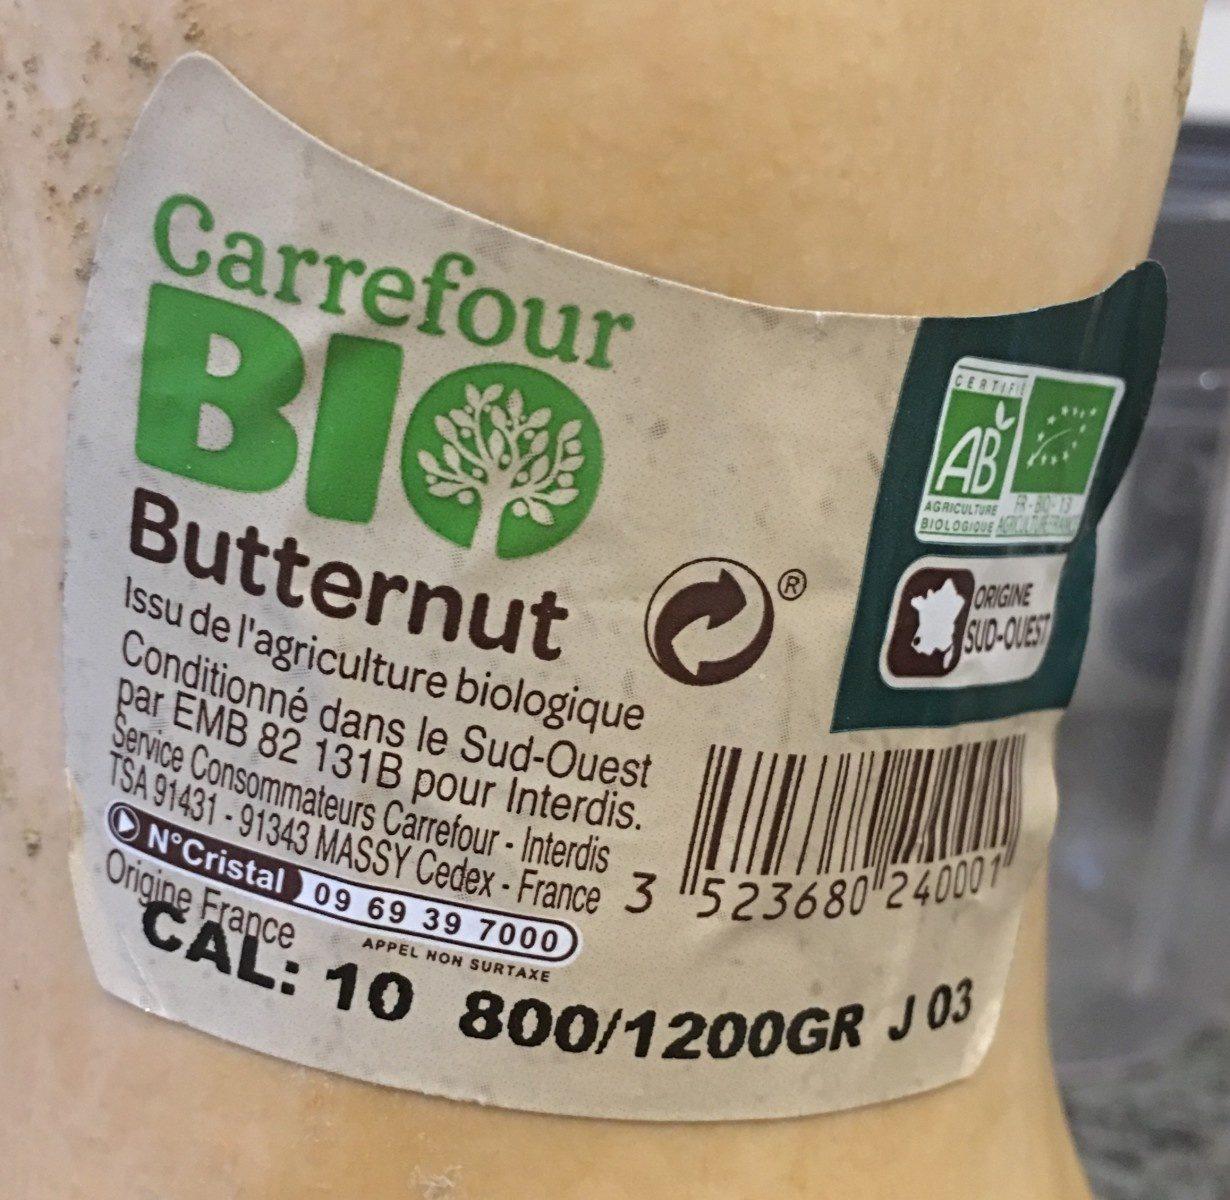 Butternut - Ingrédients - fr